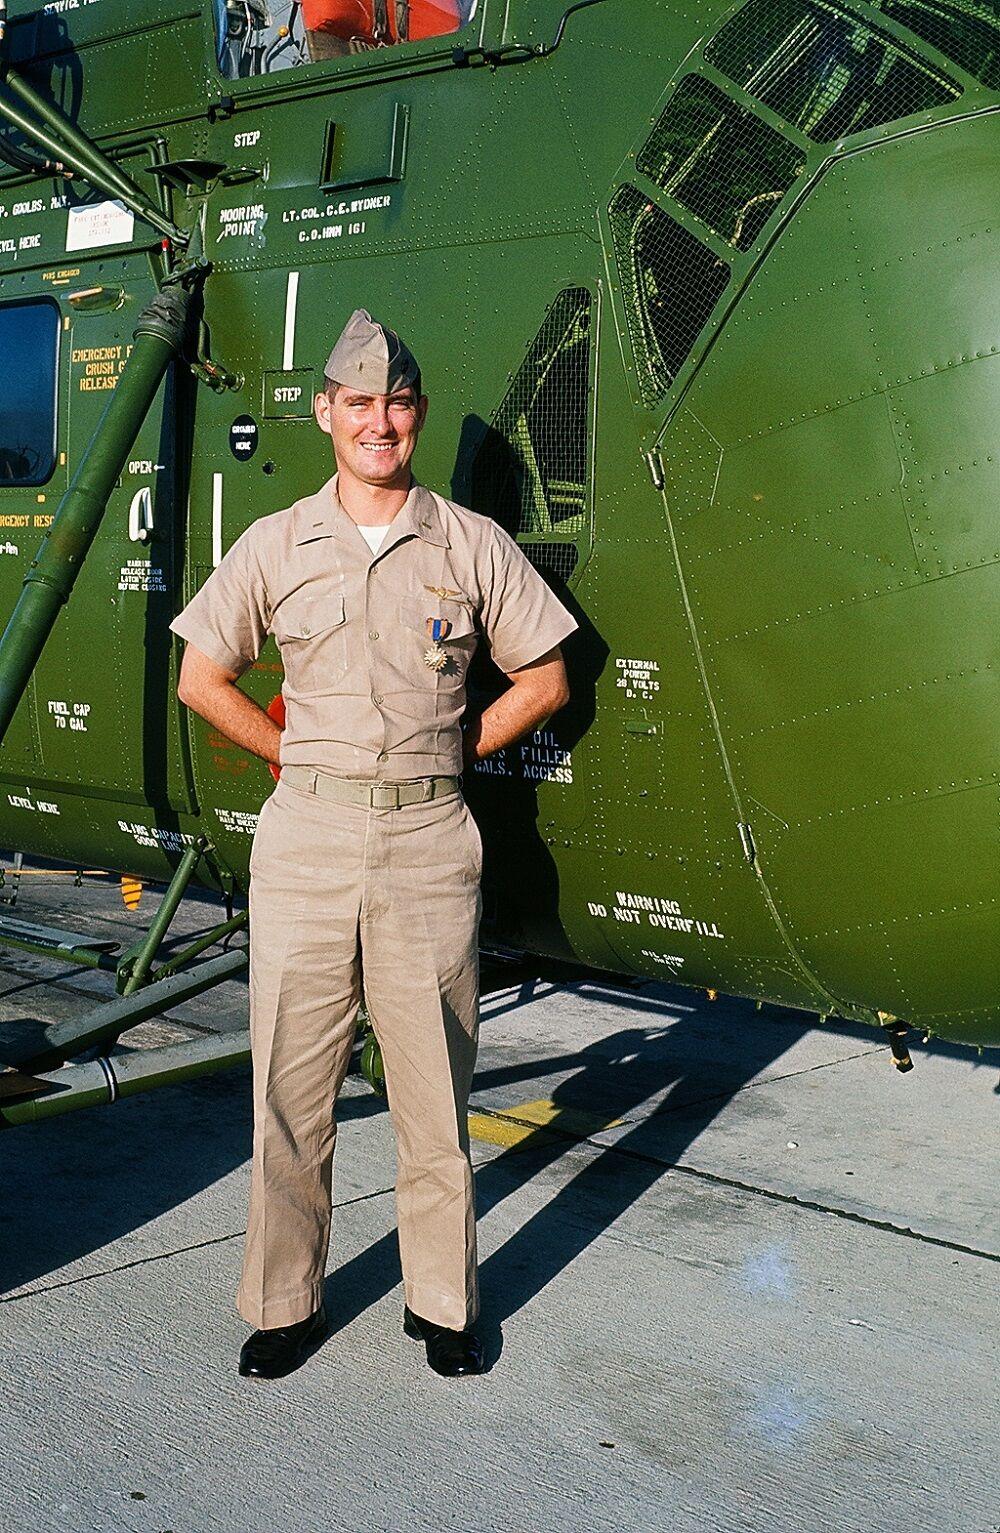 Vietnam vet Collier 1 with air medal.jpg